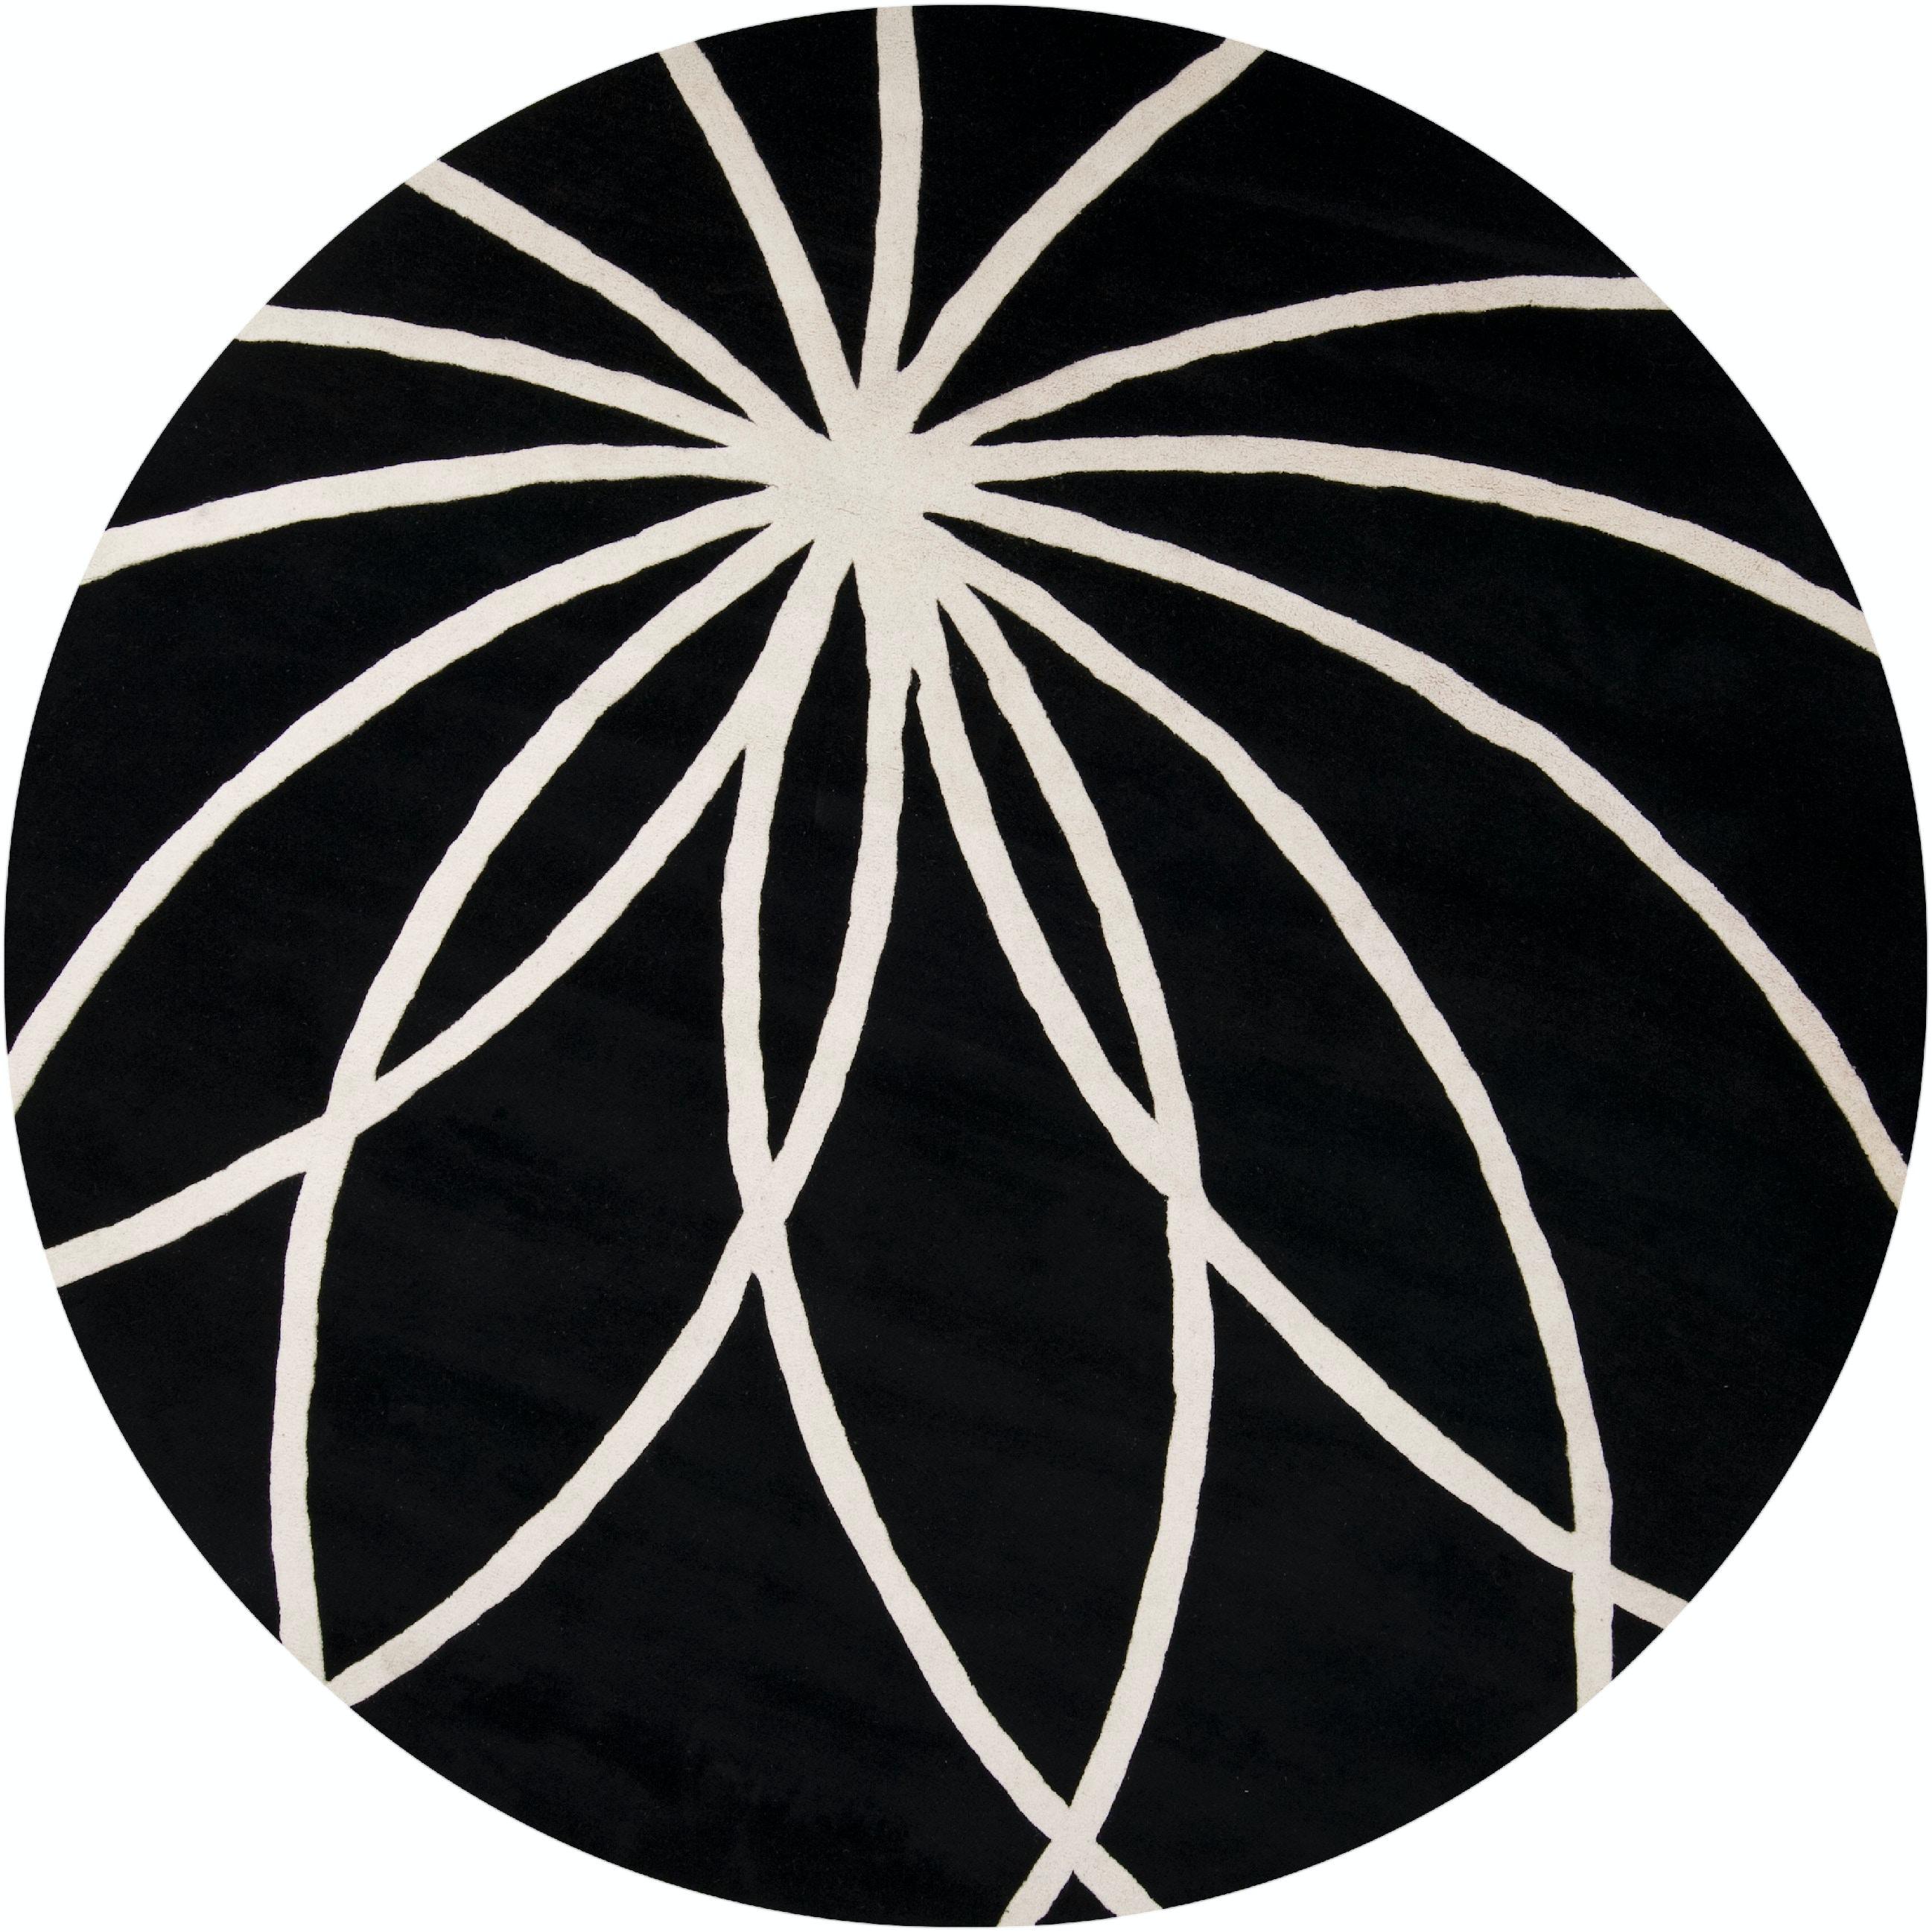 Surya Floor Coverings Forum 8 Round Rug Sryfm70728rd Walter E Smithe Furniture Design